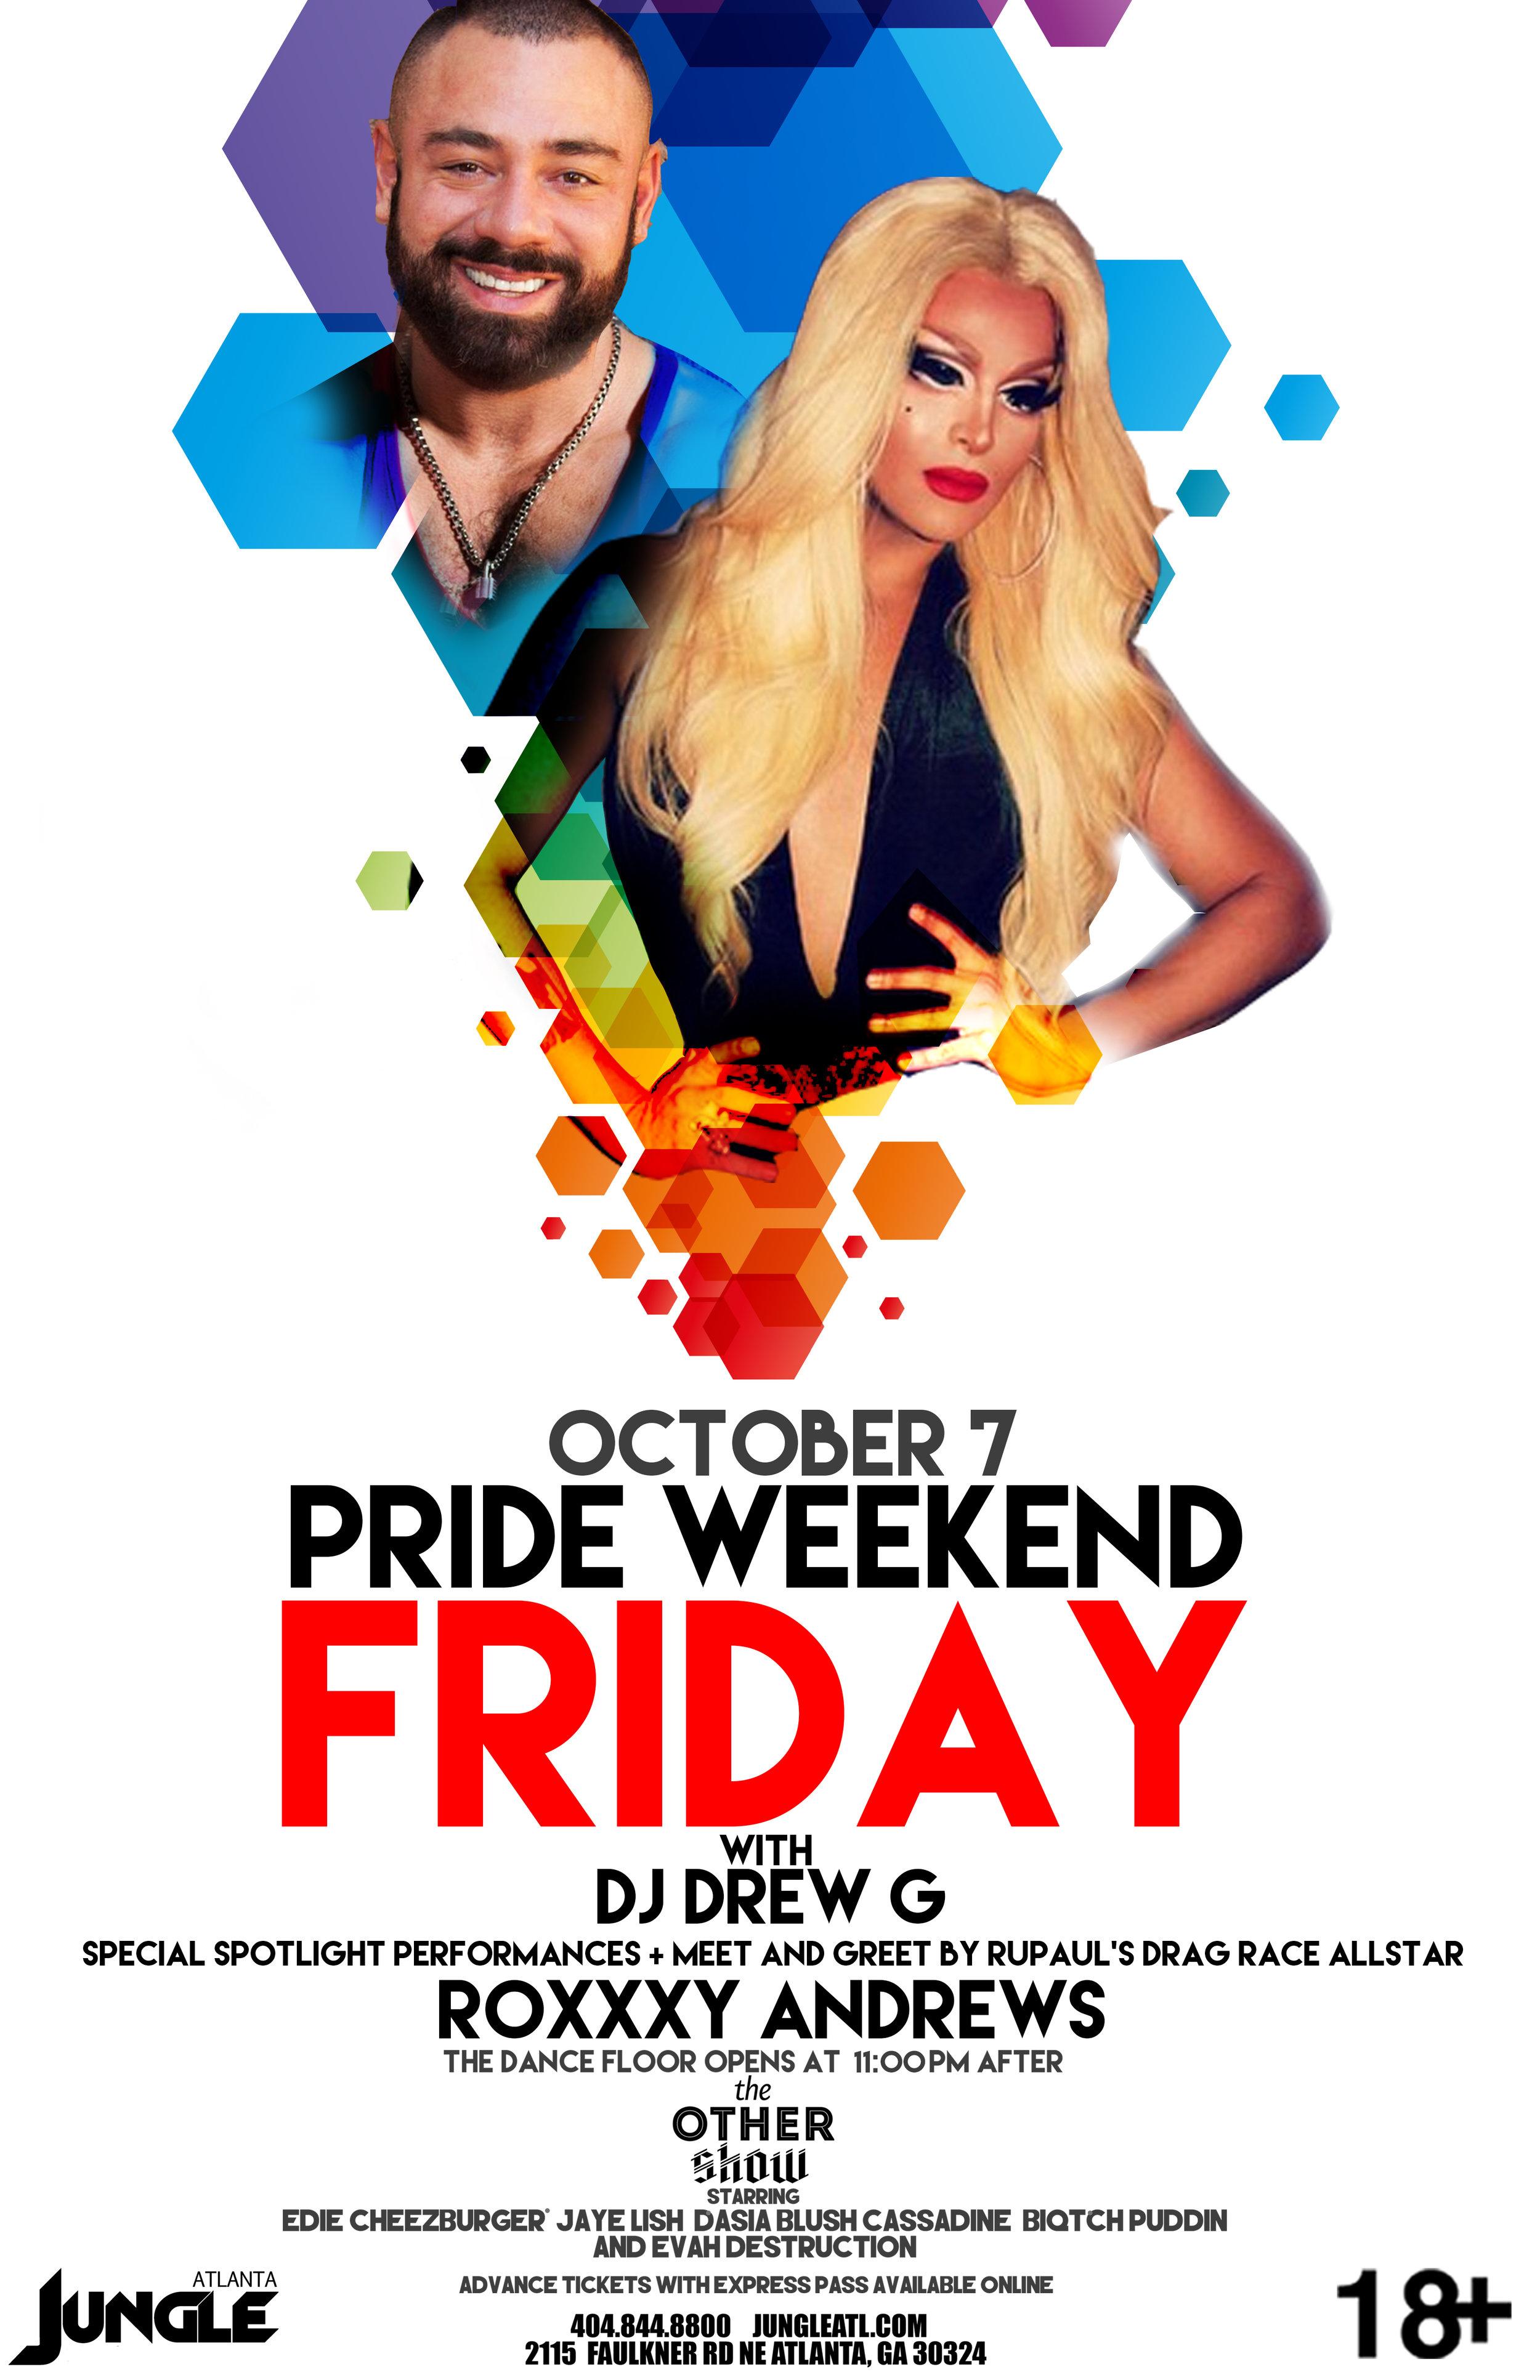 pride2FRIDAY2016.jpg